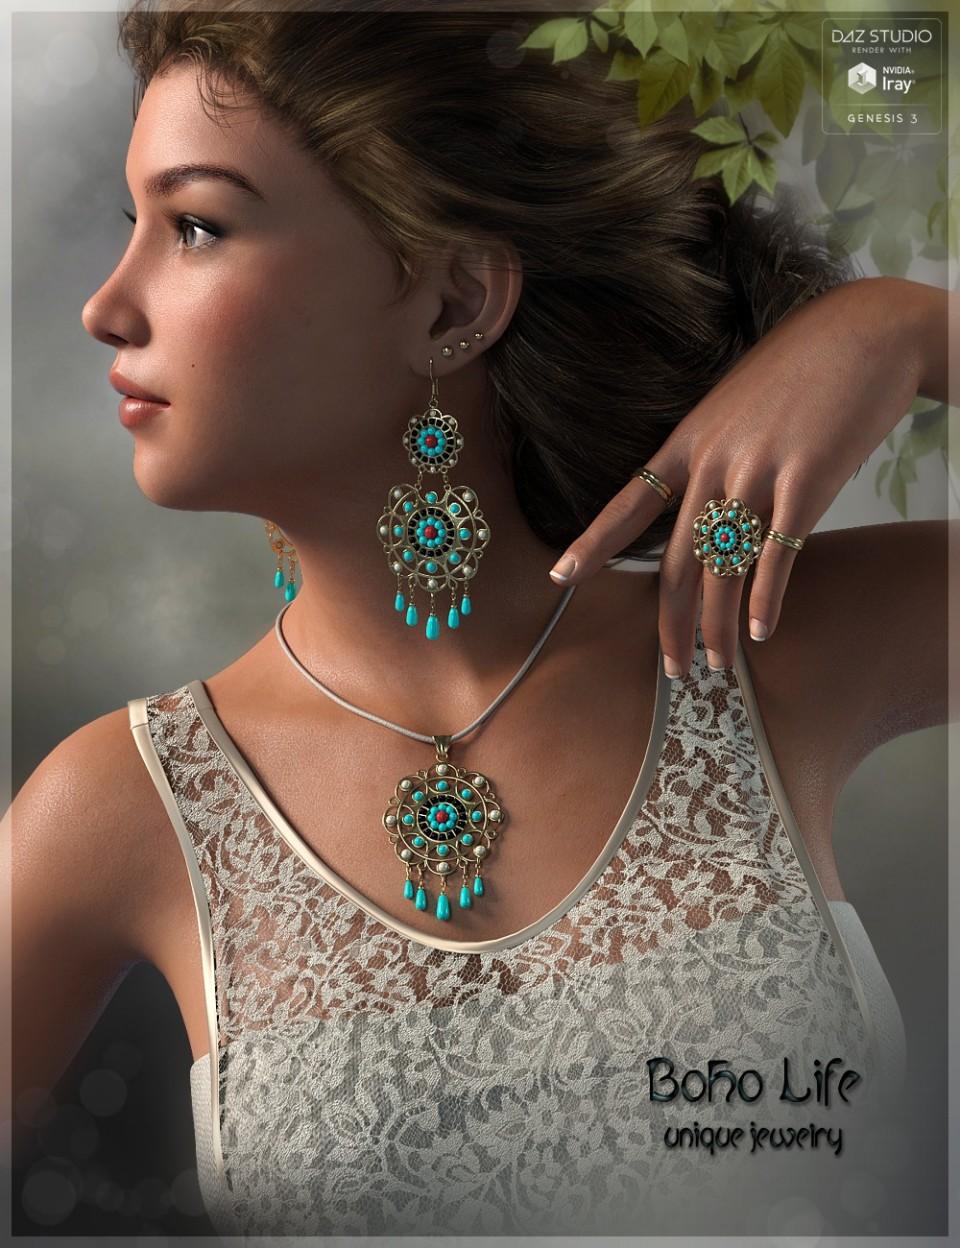 Boho Life Jewelry G3F_DAZ3D下载站